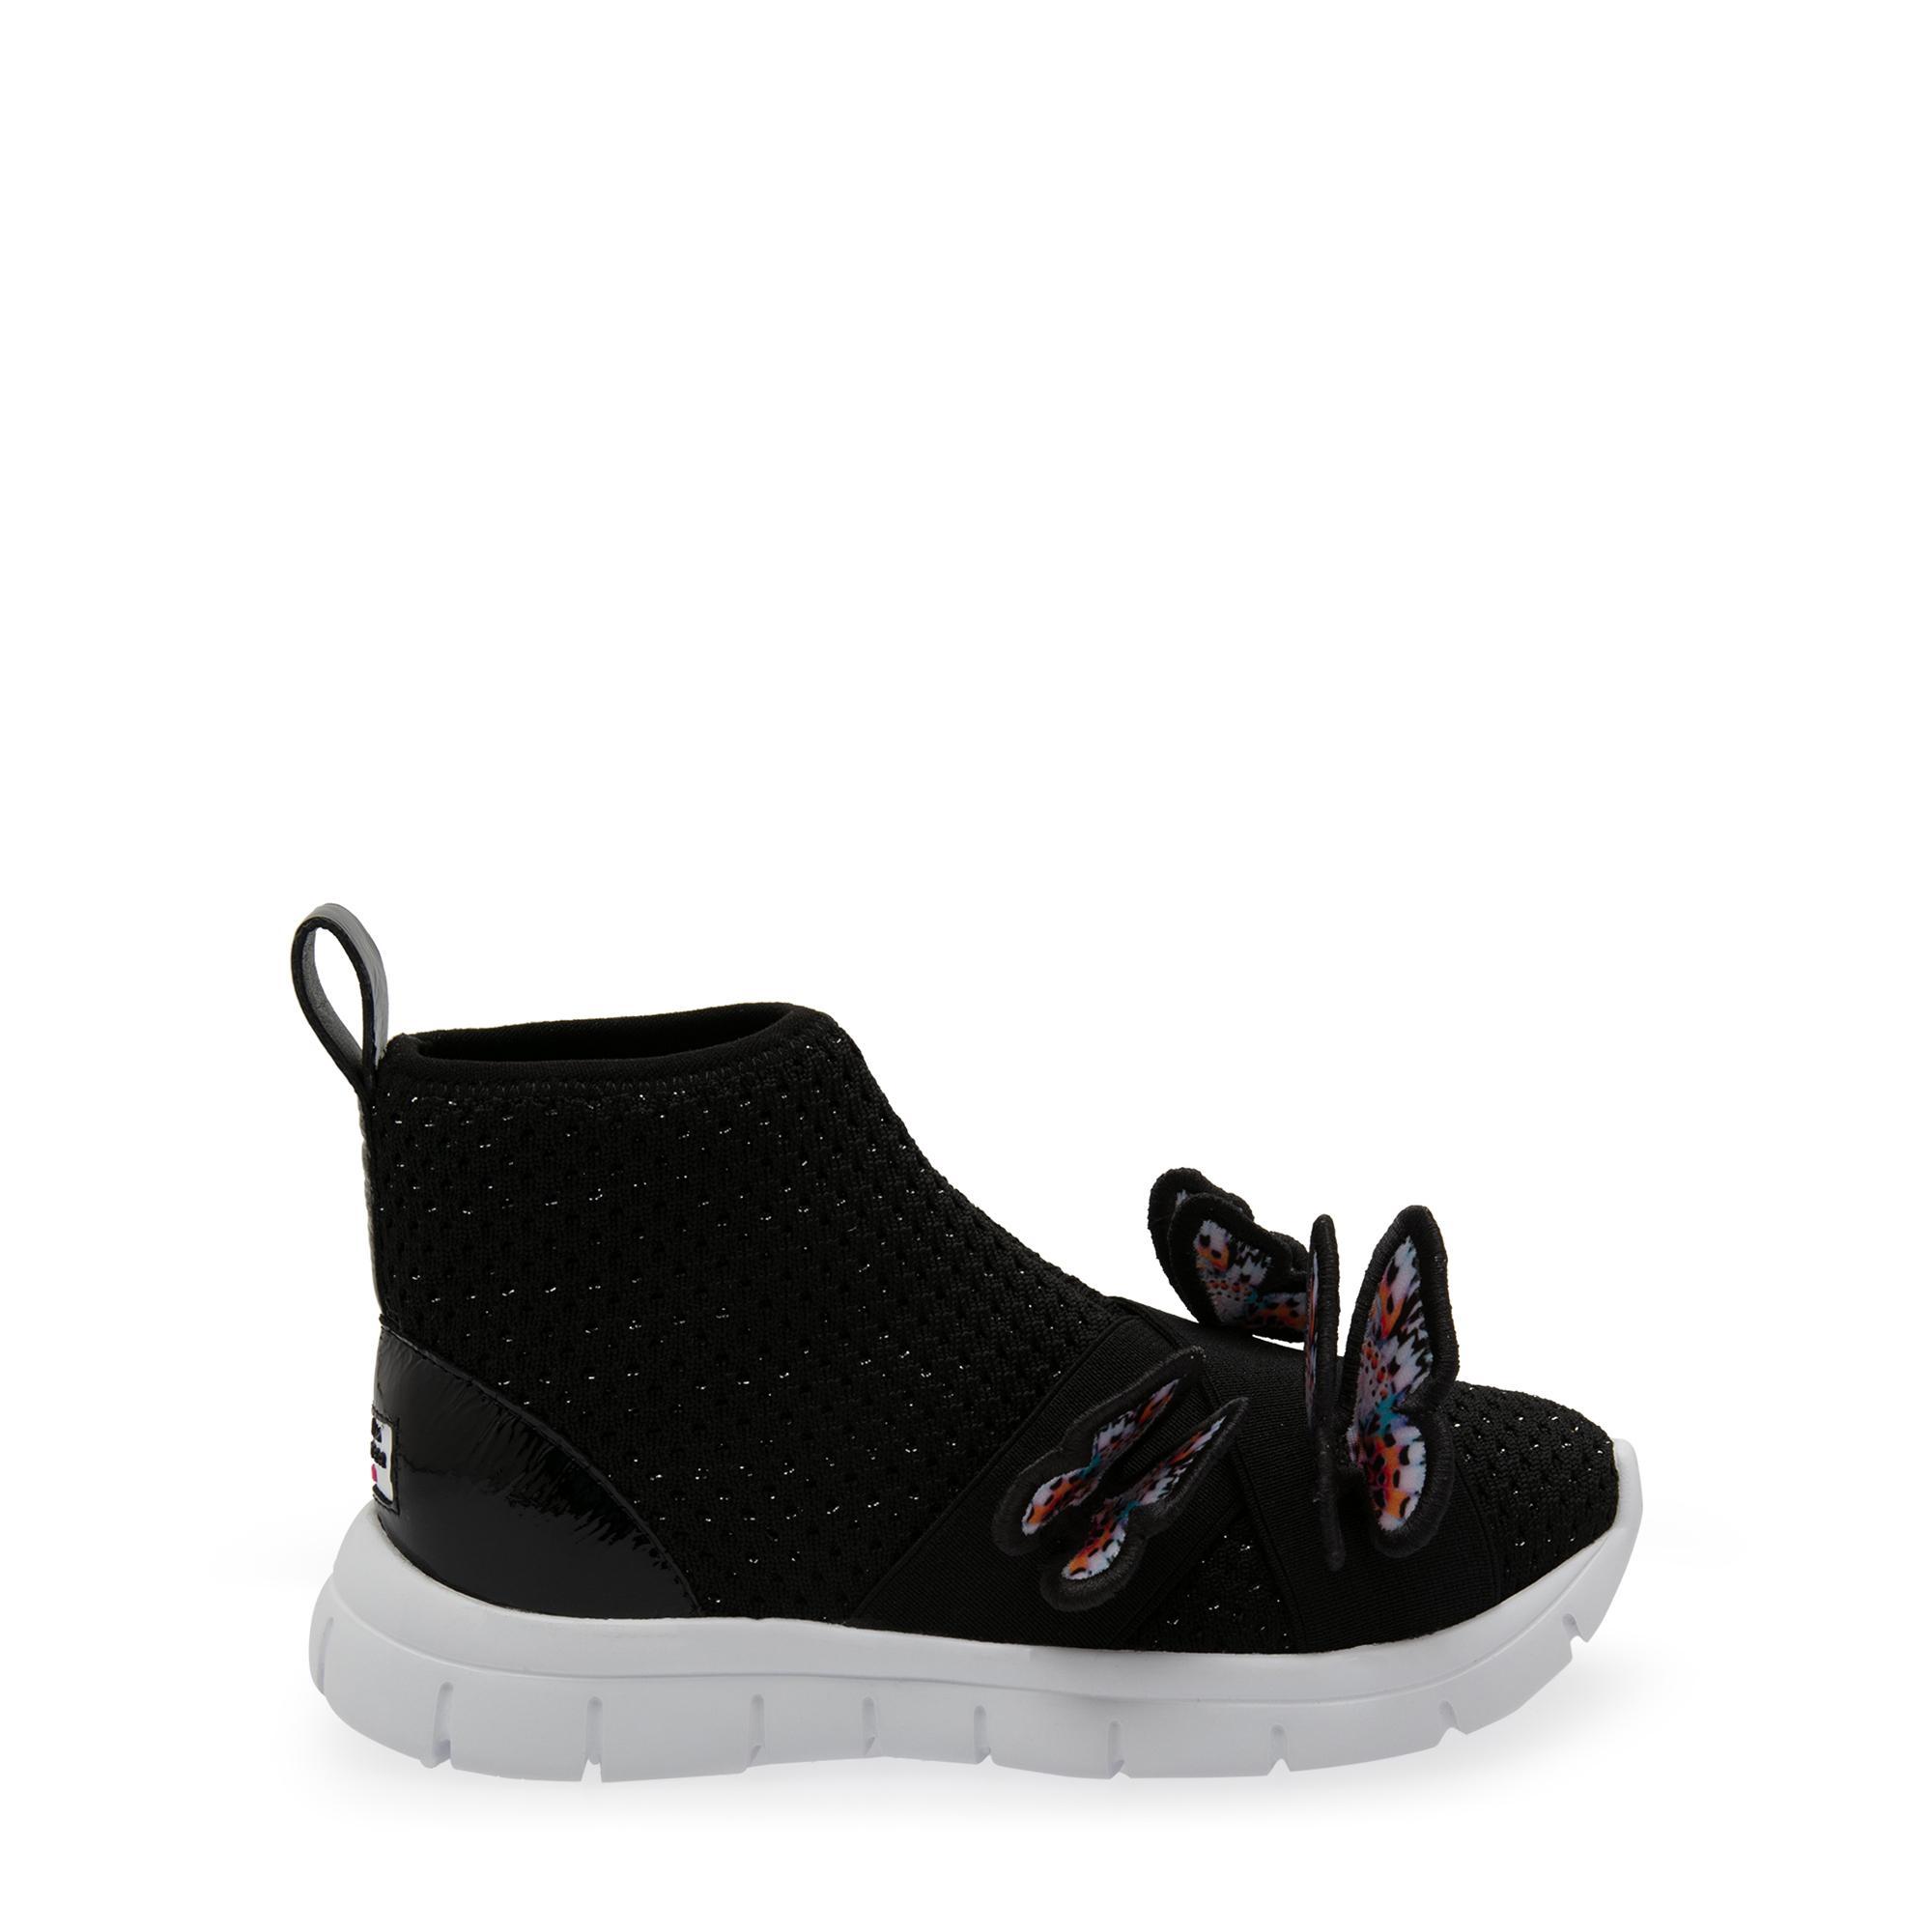 Maisy sneakers